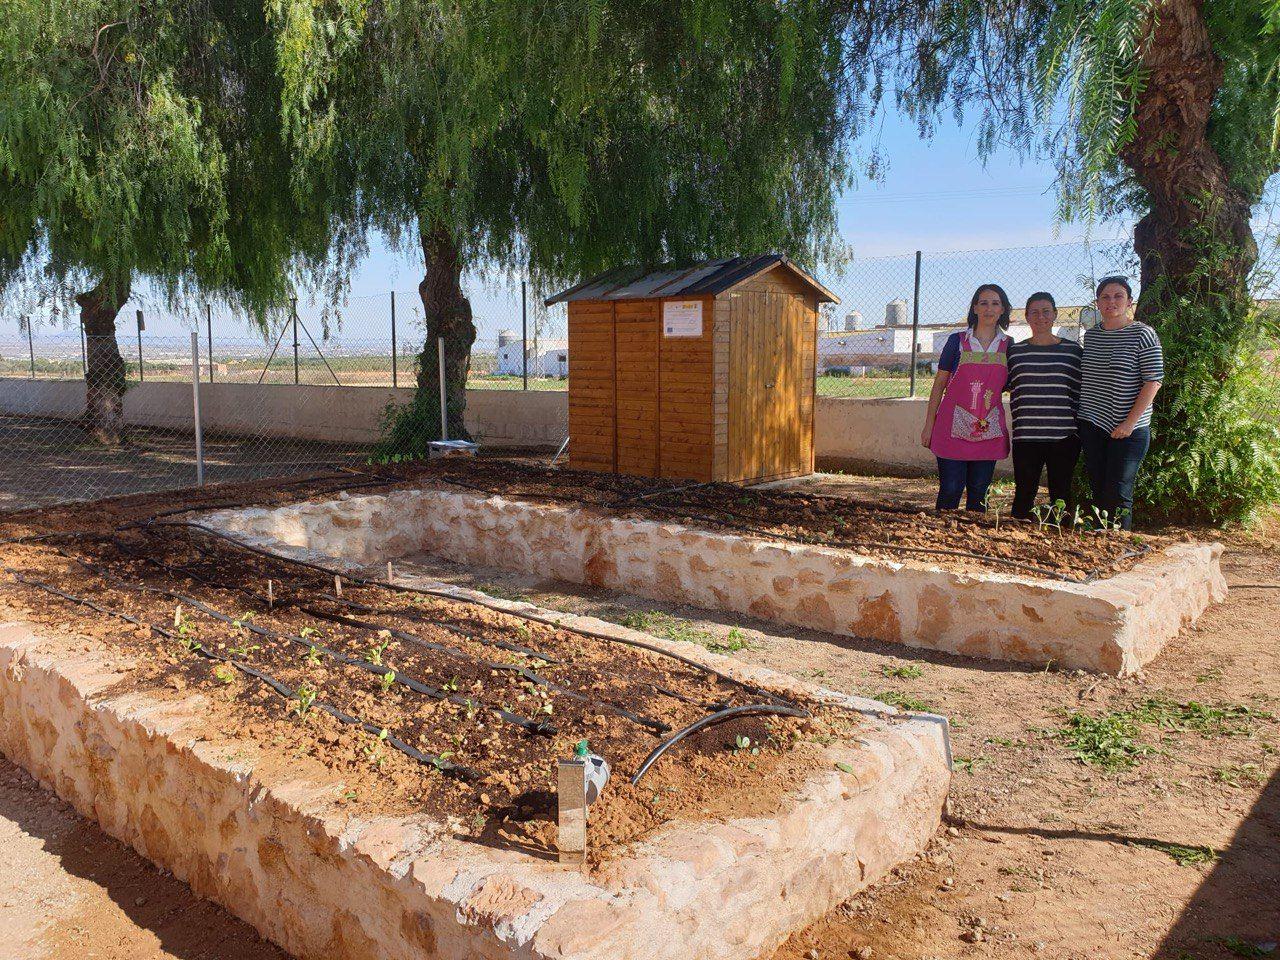 photo5384203734667603725 - Red Rural de Huertos Escolares